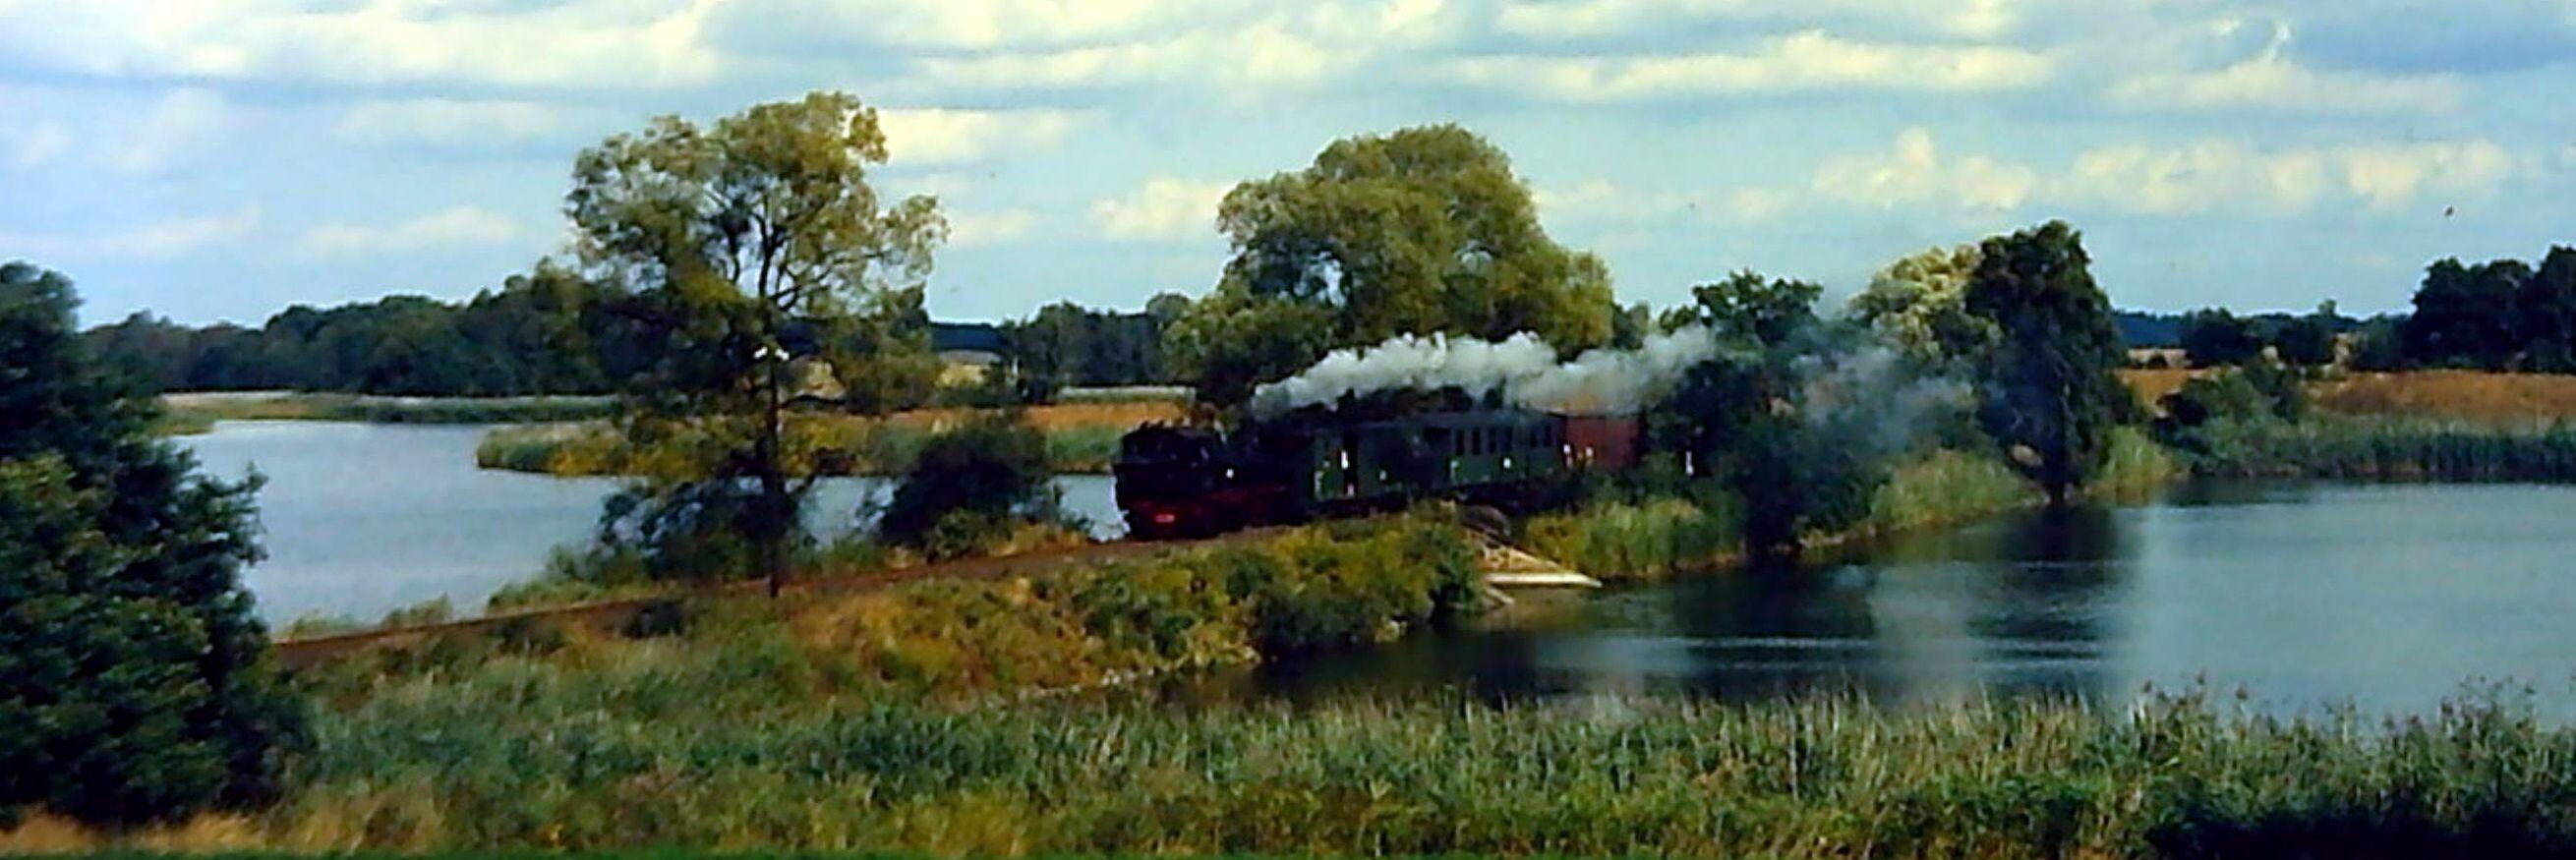 Zug der Löß´nitzgrundbahn überquert Dippelsdorfer Teich